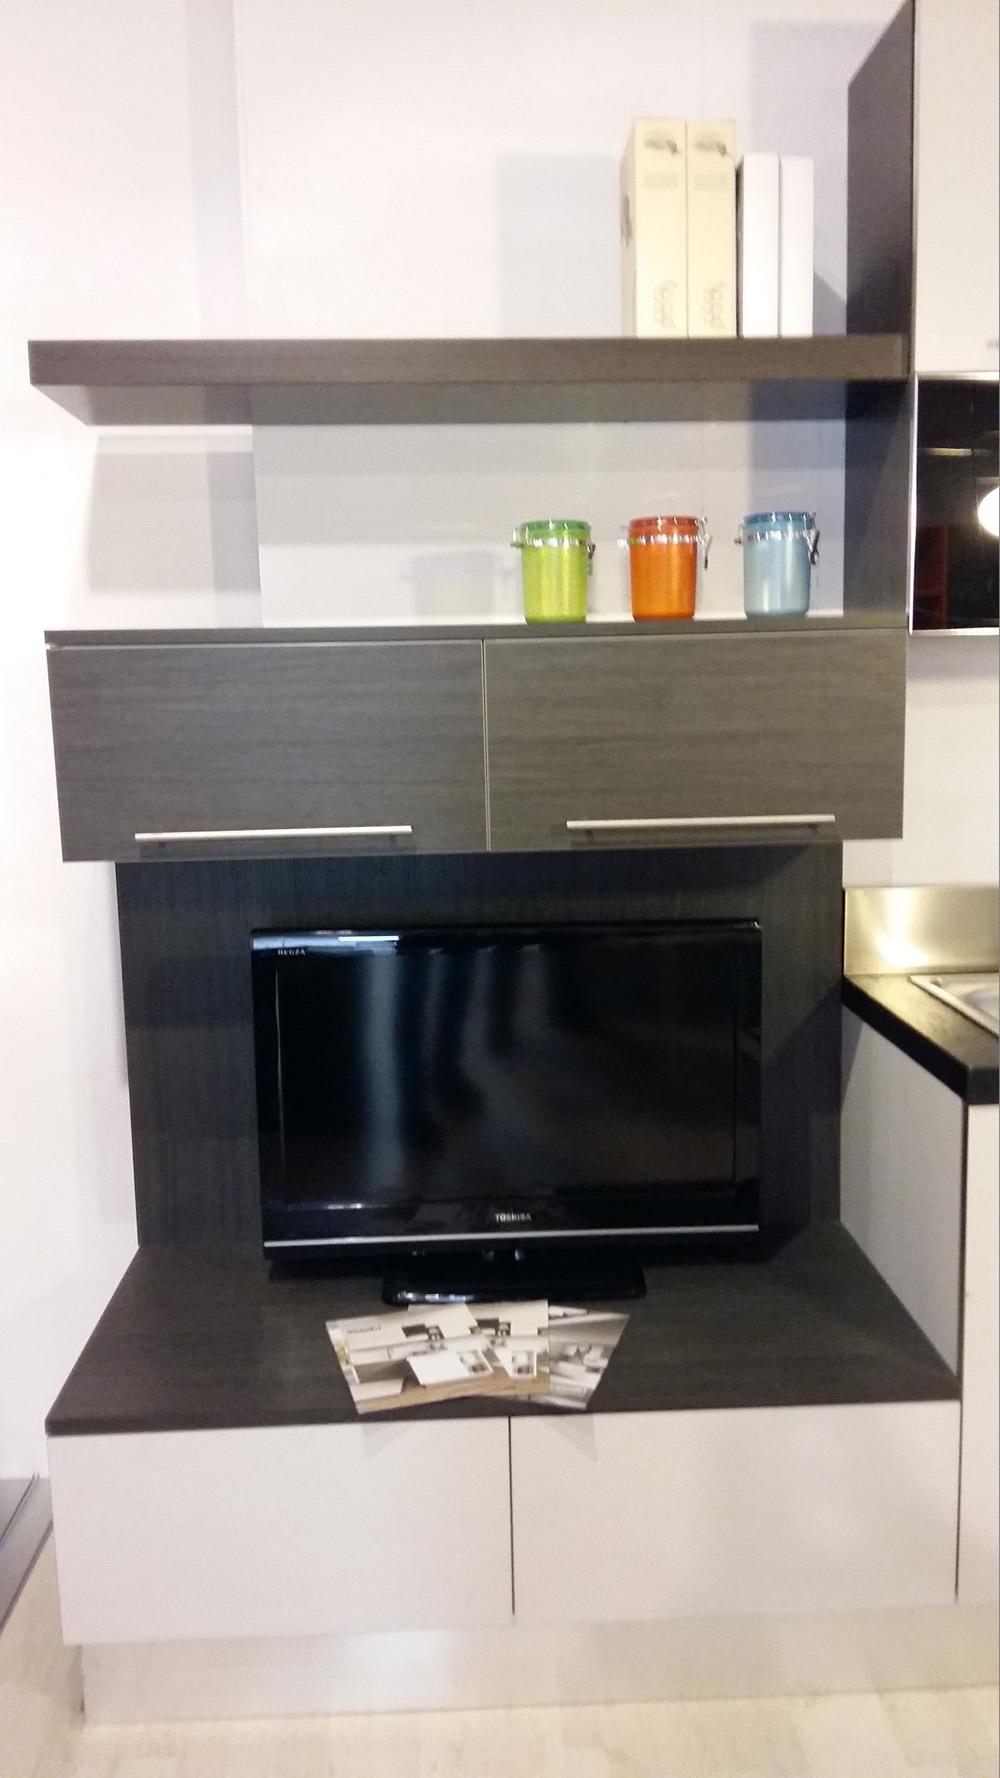 Aran cucine cucina bella moderno laminato materico bianca - Anta cucina laminato ...